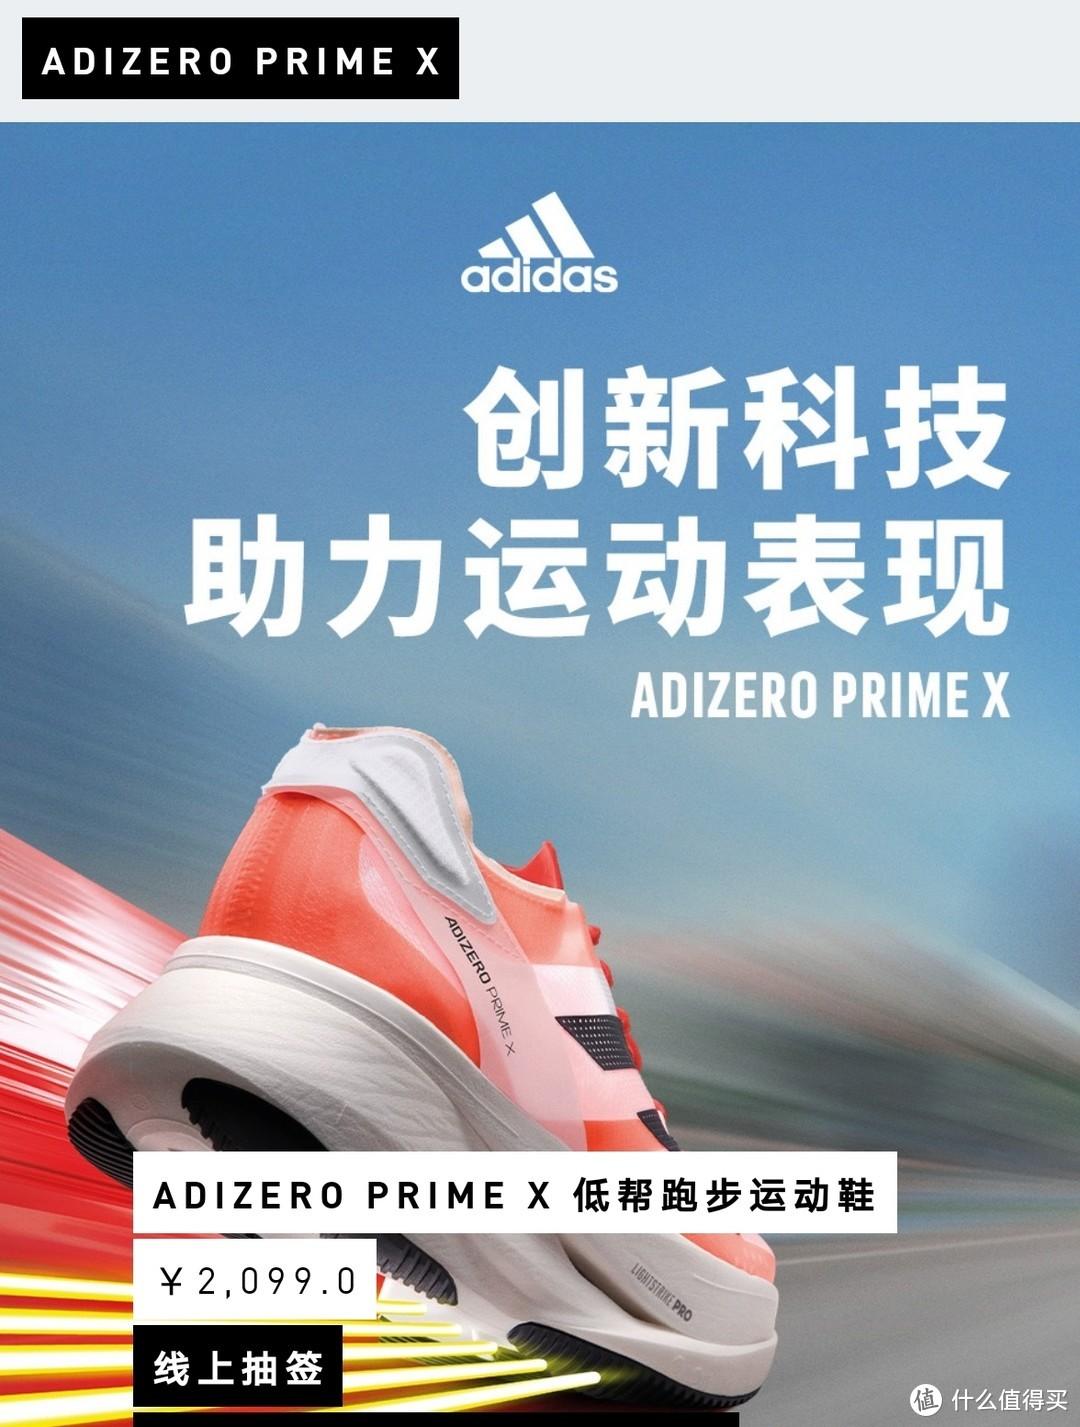 adidas adizero Prime X 碳板鞋,来一双尝尝鲜吗?